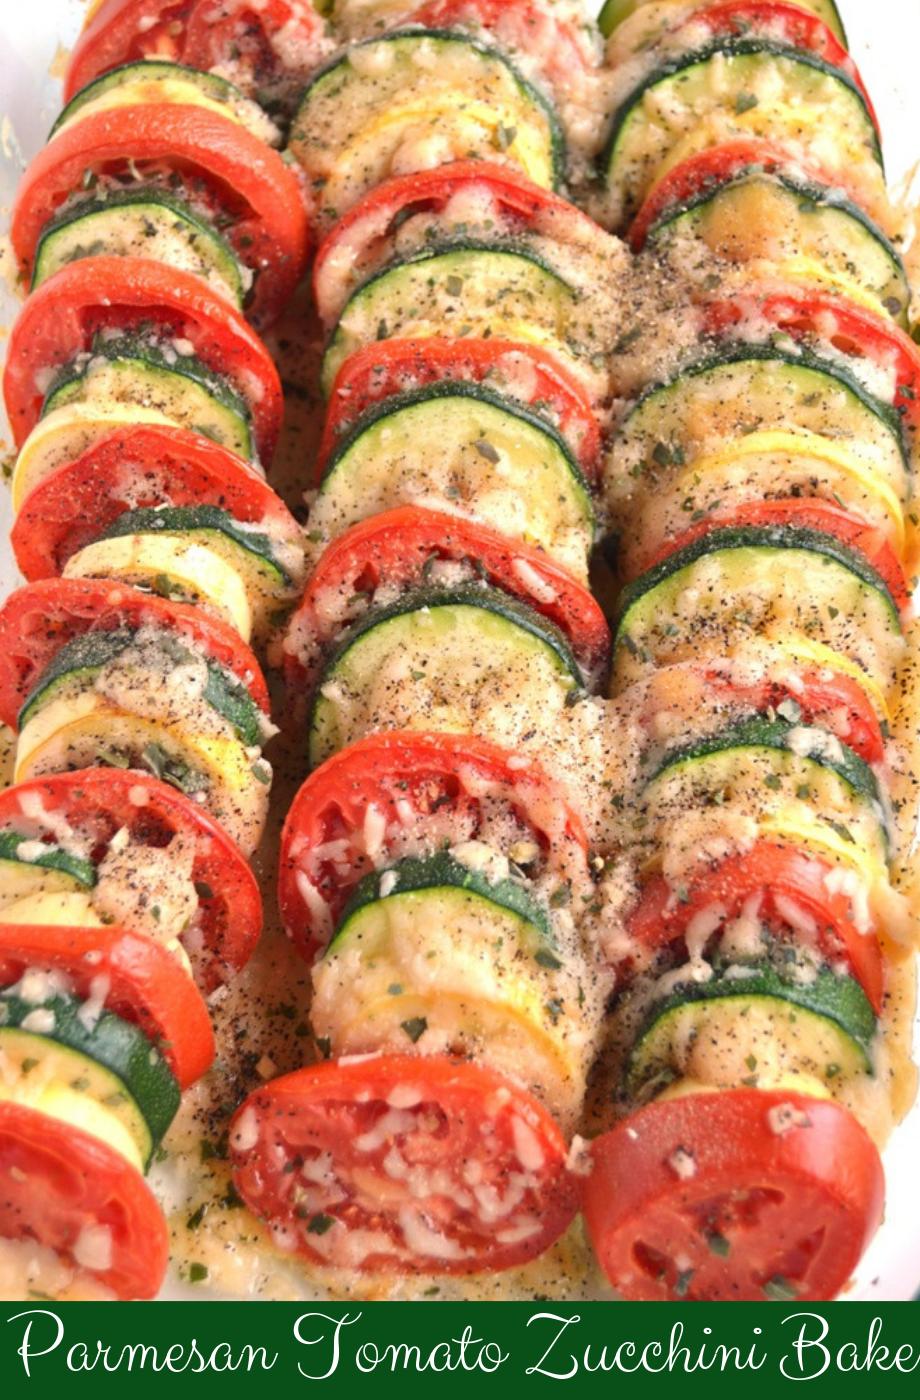 Parmesan Tomato Zucchini Bake images